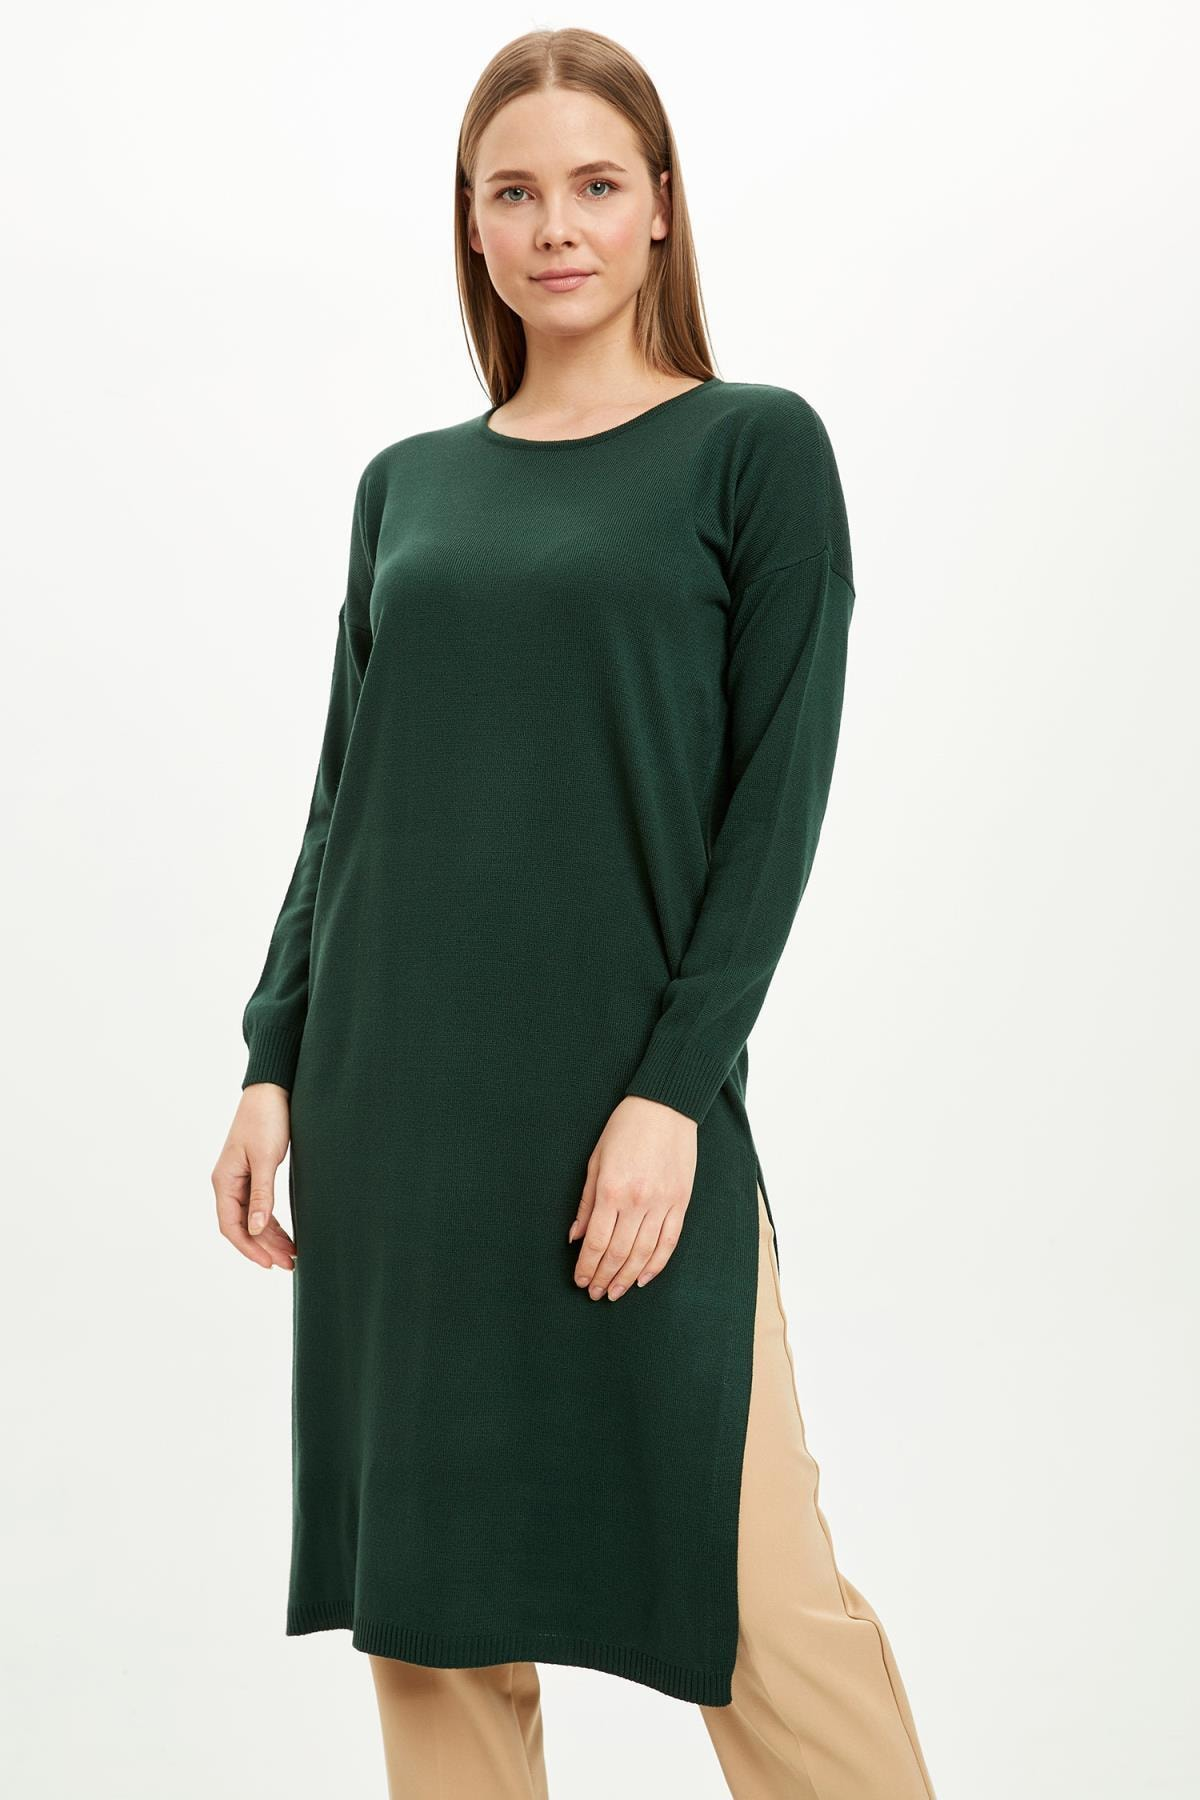 DeFacto Kadın Yeşil Düşük Kol Detaylı Yırtmaçlı Triko Tunik J5571AZ20WN